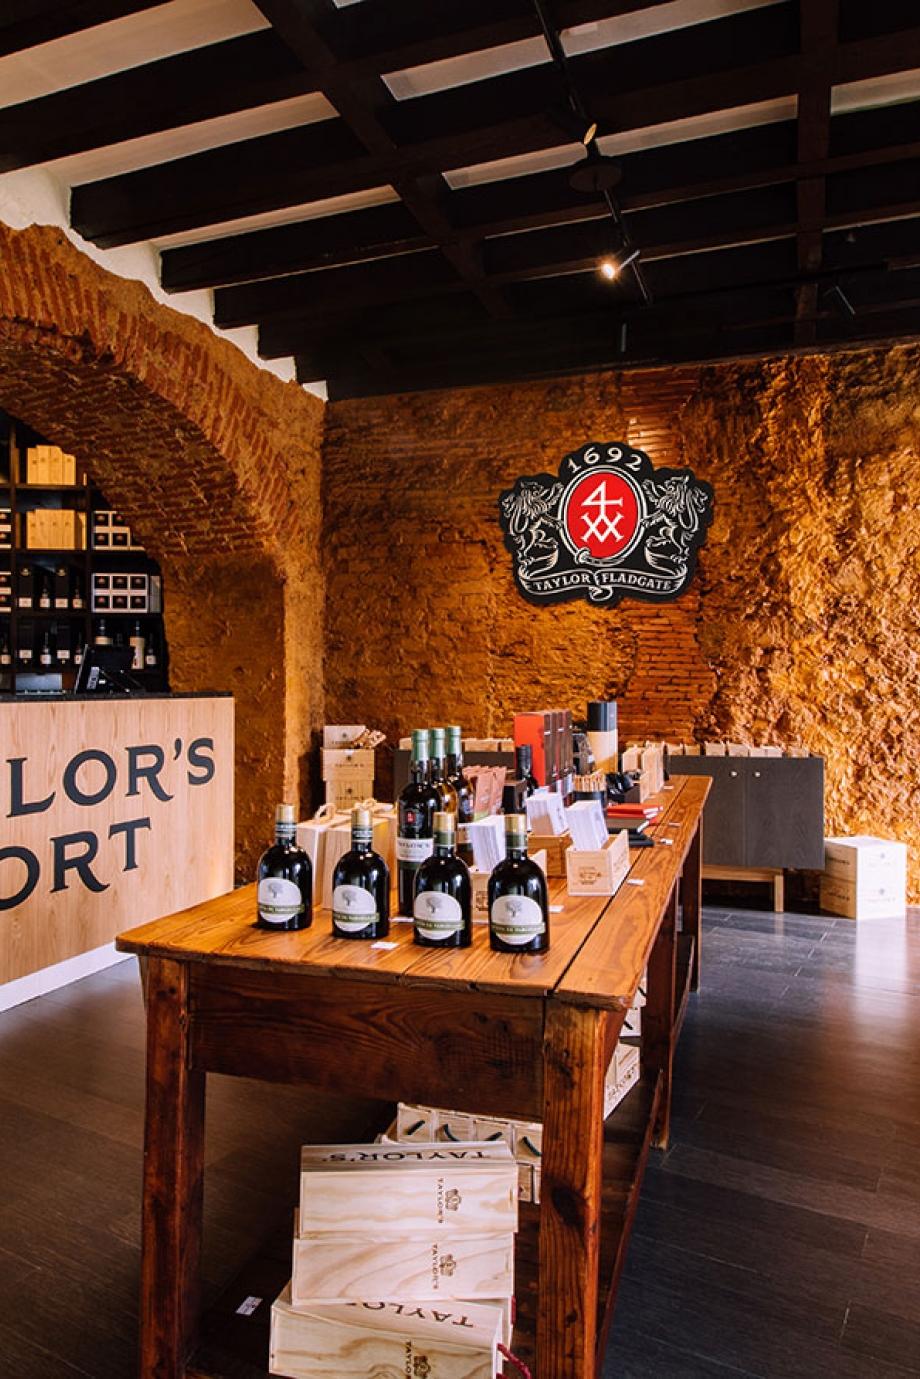 LisboaCool_Blog_ Sala de Provas da Taylor's fica em Lisboa